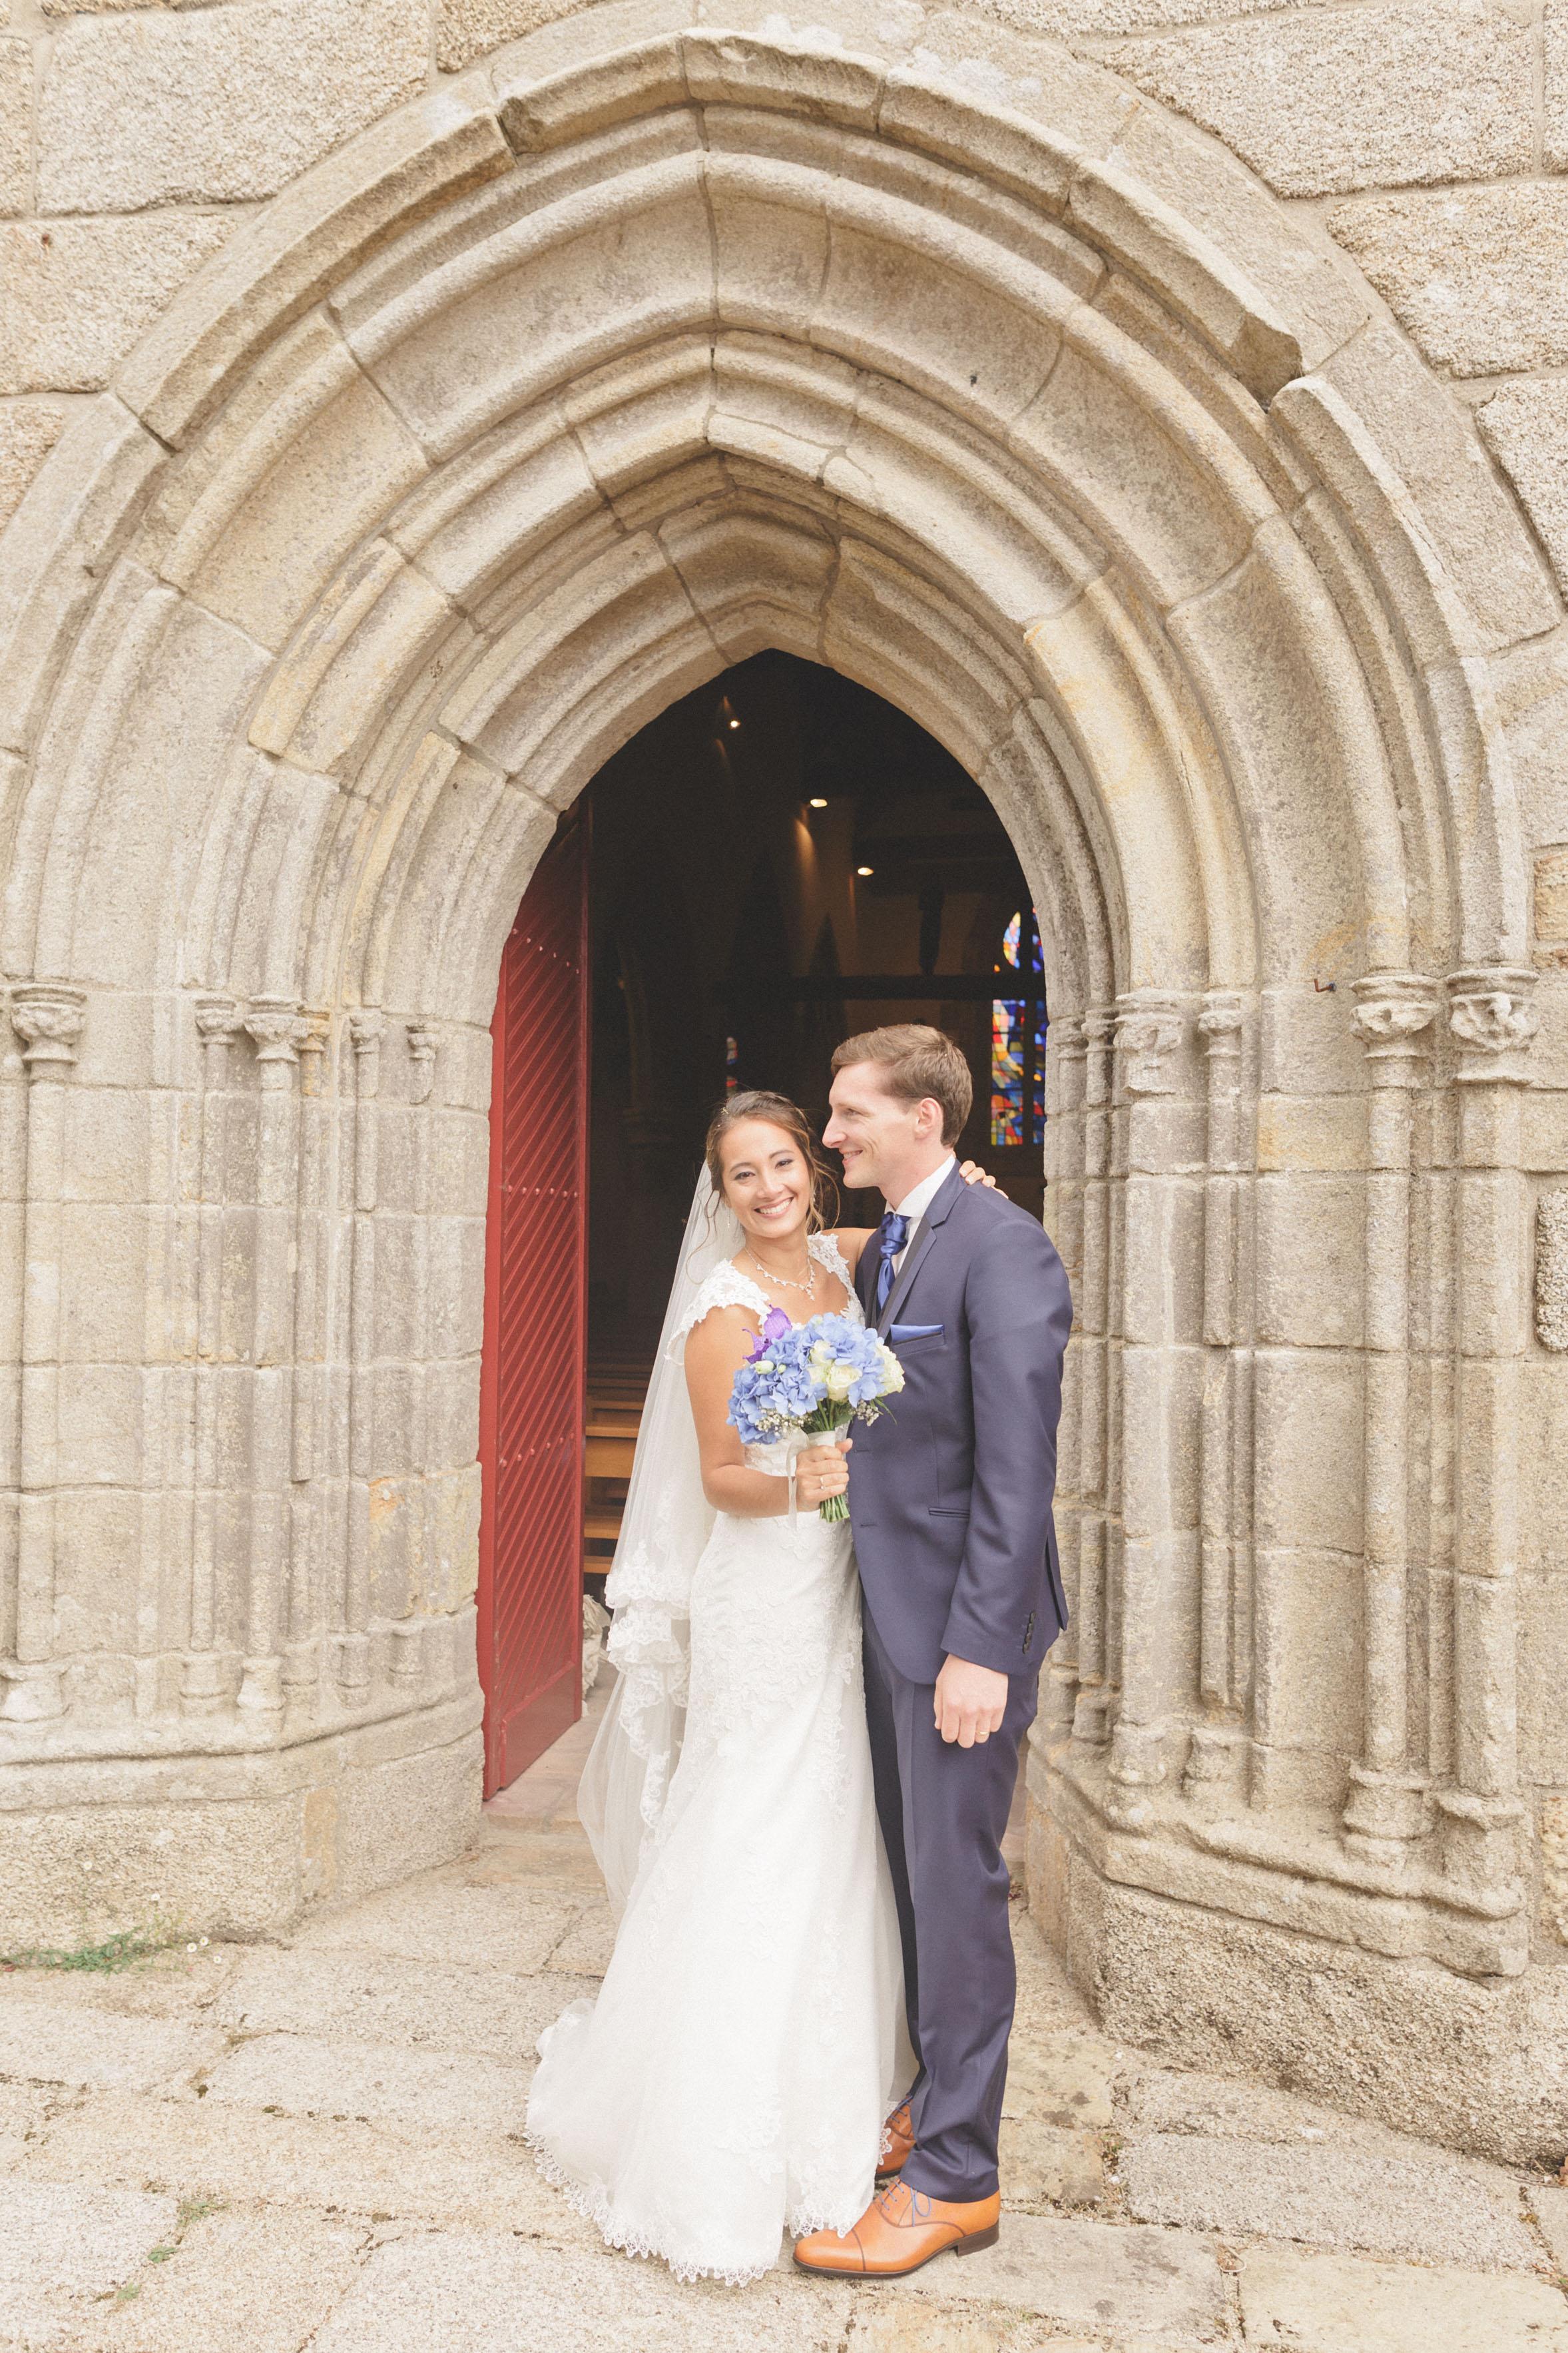 Photographie - Mariage - Bretagne - Finistere - Morbihan - Lilian Vezin Photographie (26)